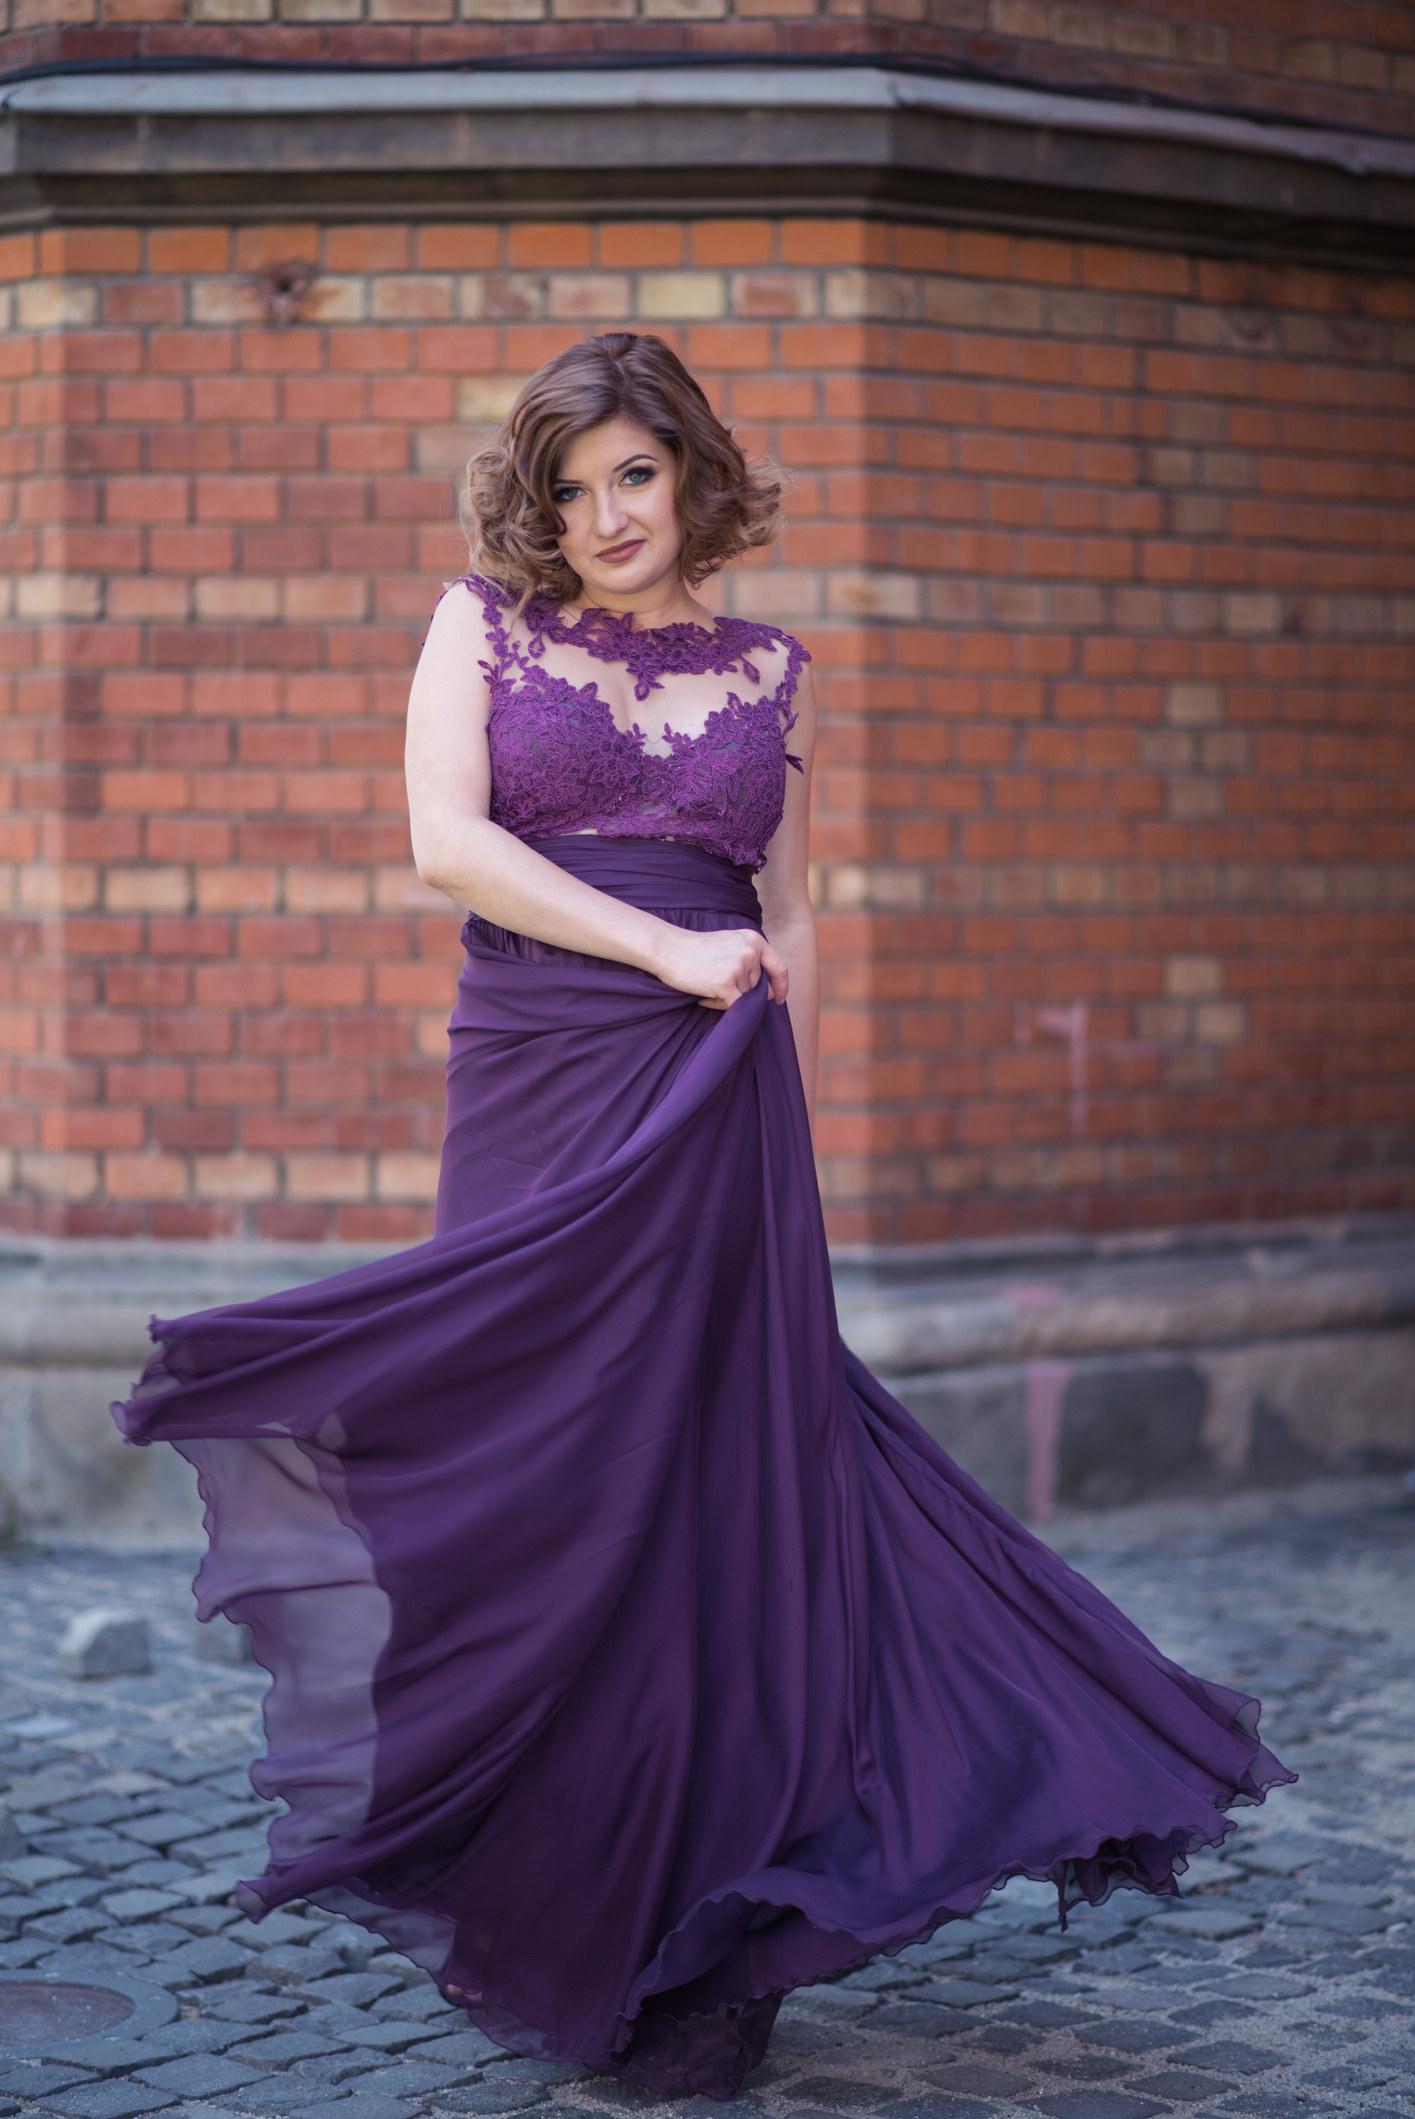 photo of woman in a purple dress